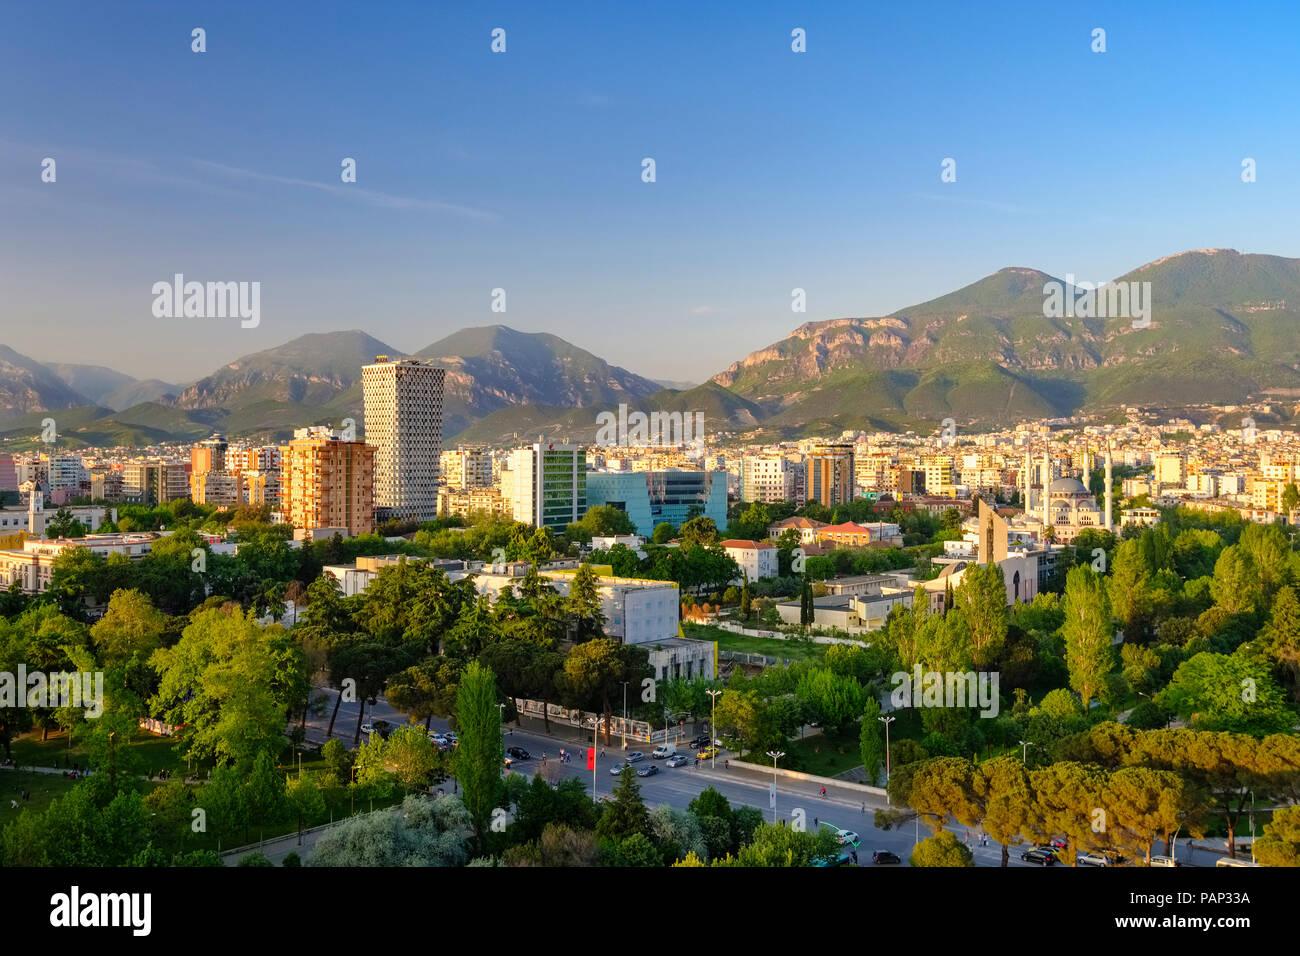 Albania, Tirana, City center, TID Tower and Namazgah Mosque - Stock Image